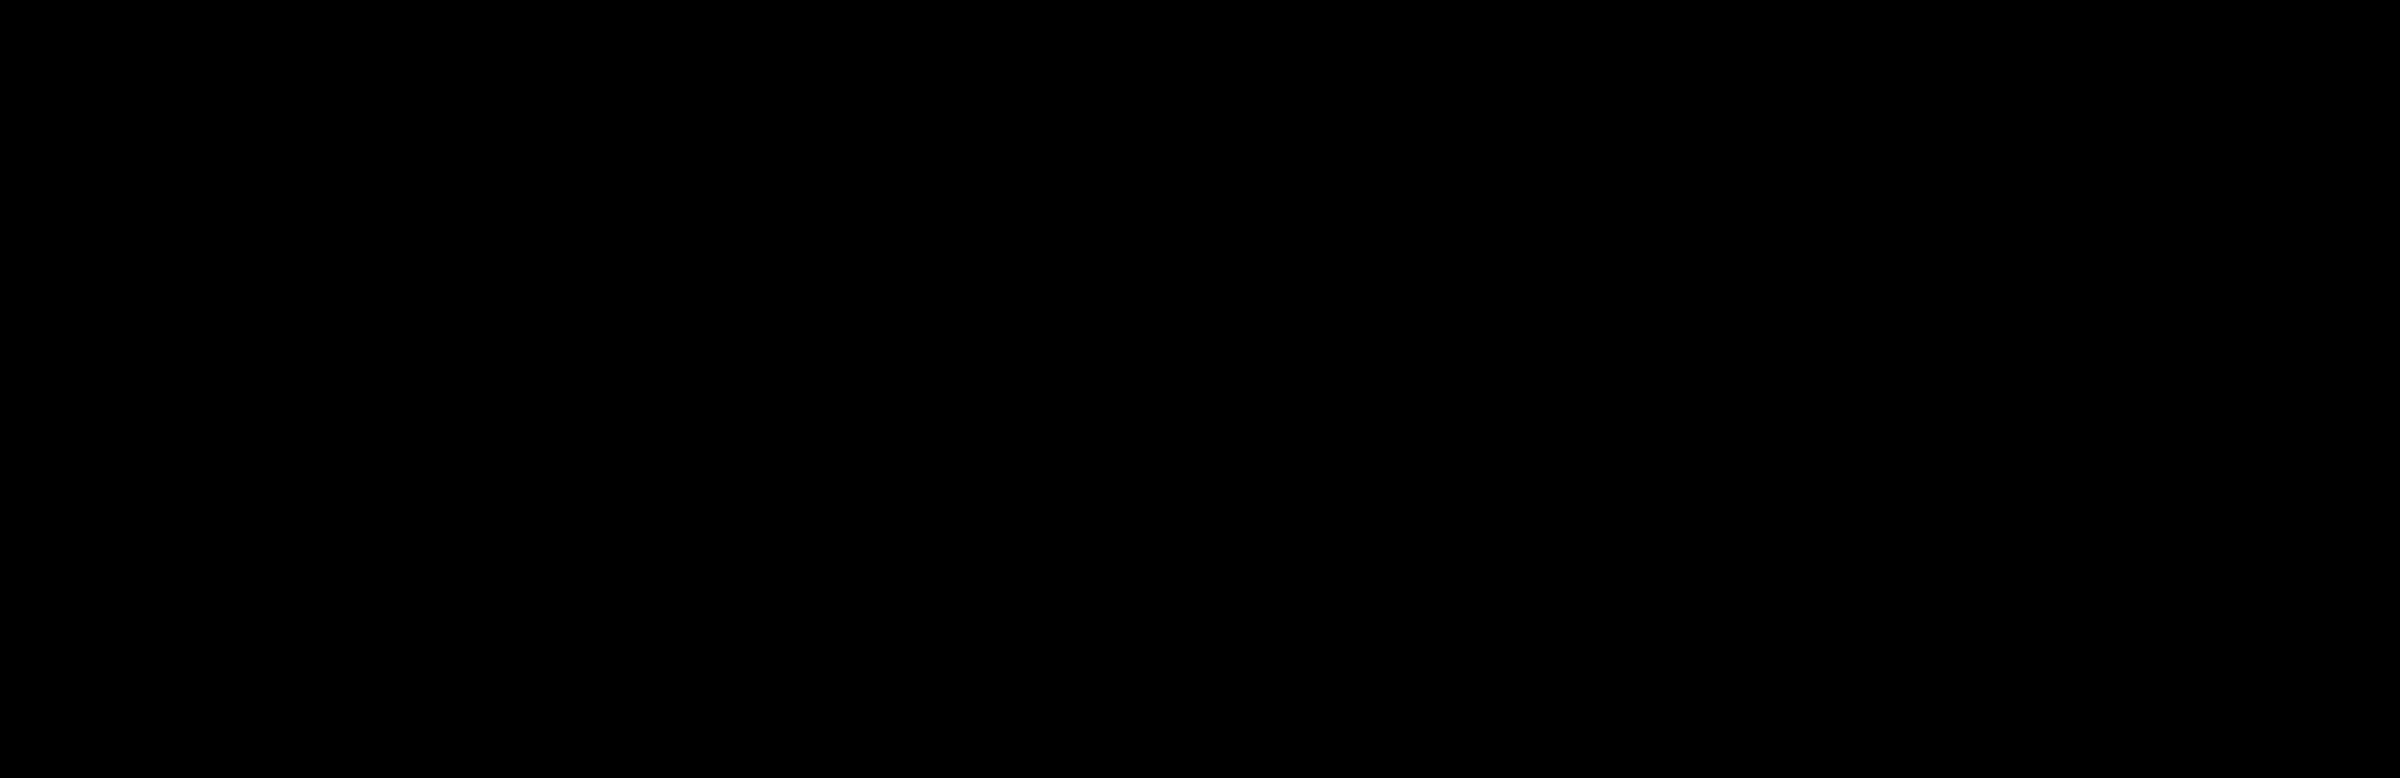 Keys PNG Black And White - 153908